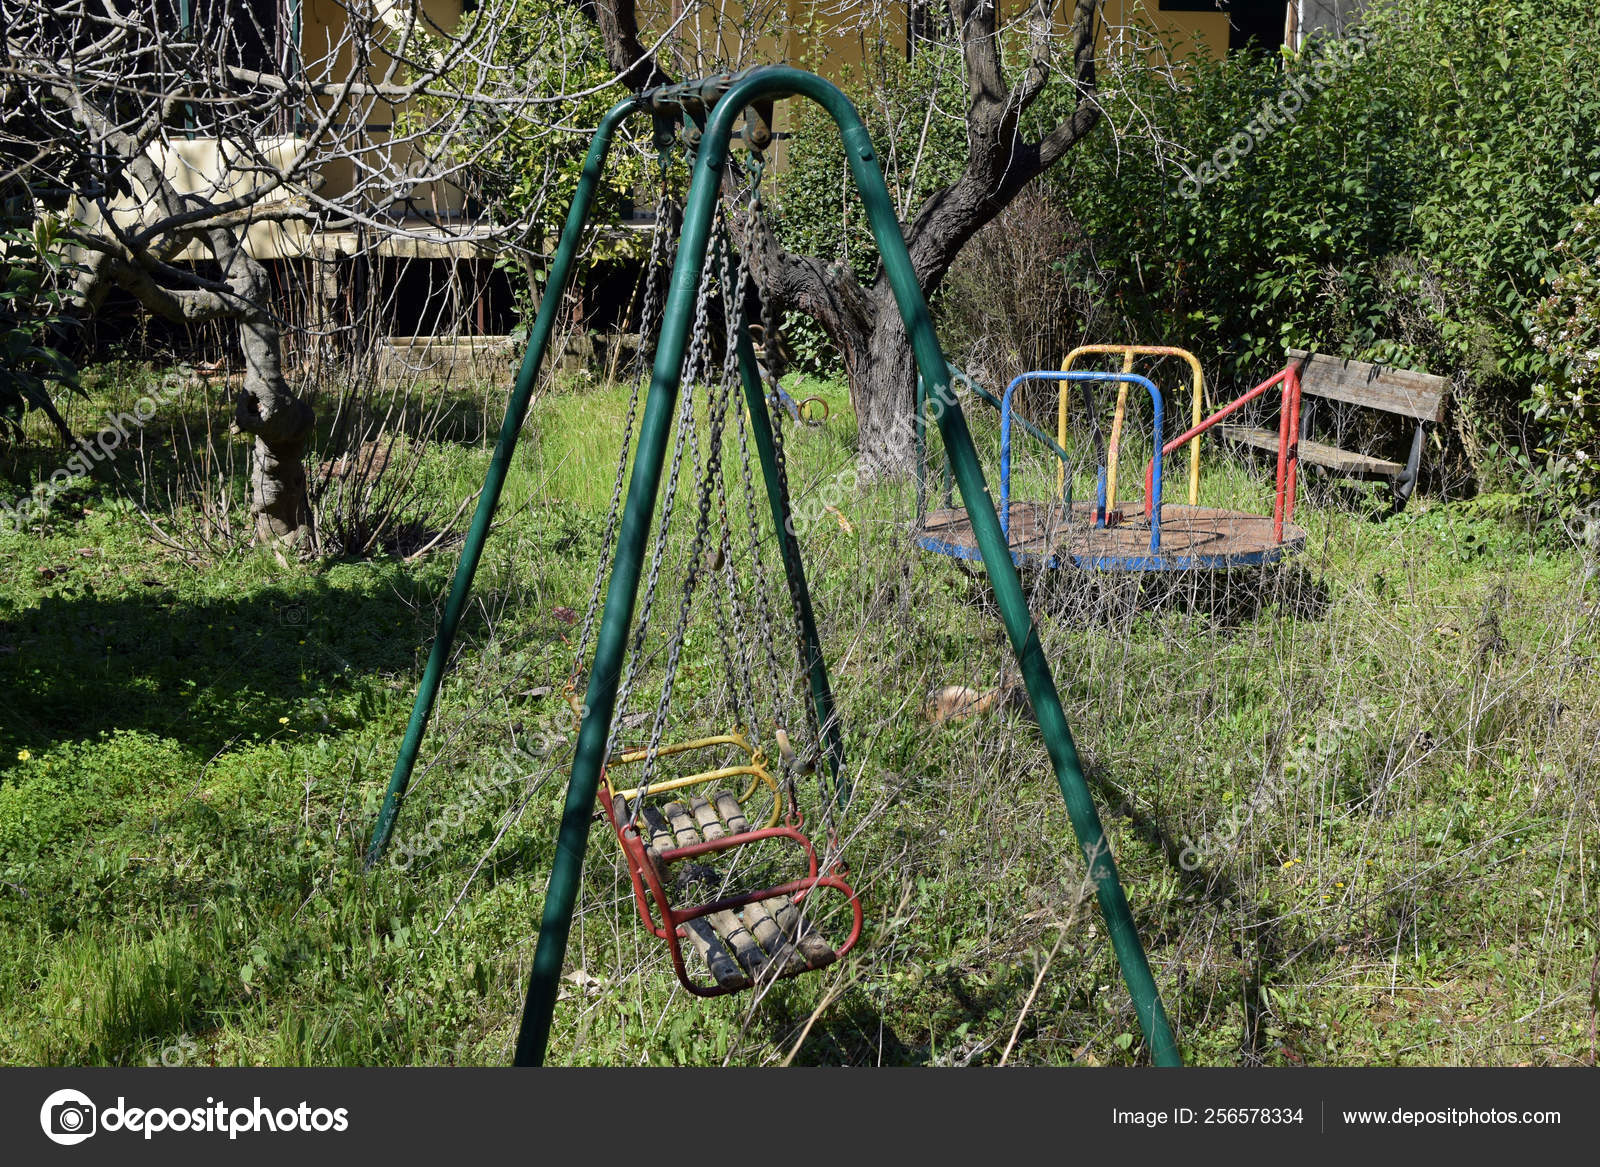 Old Playground Merry Go Round Abandoned Playground Old Swings And Merry Go Round Stock Photo C Sirylok 256578334